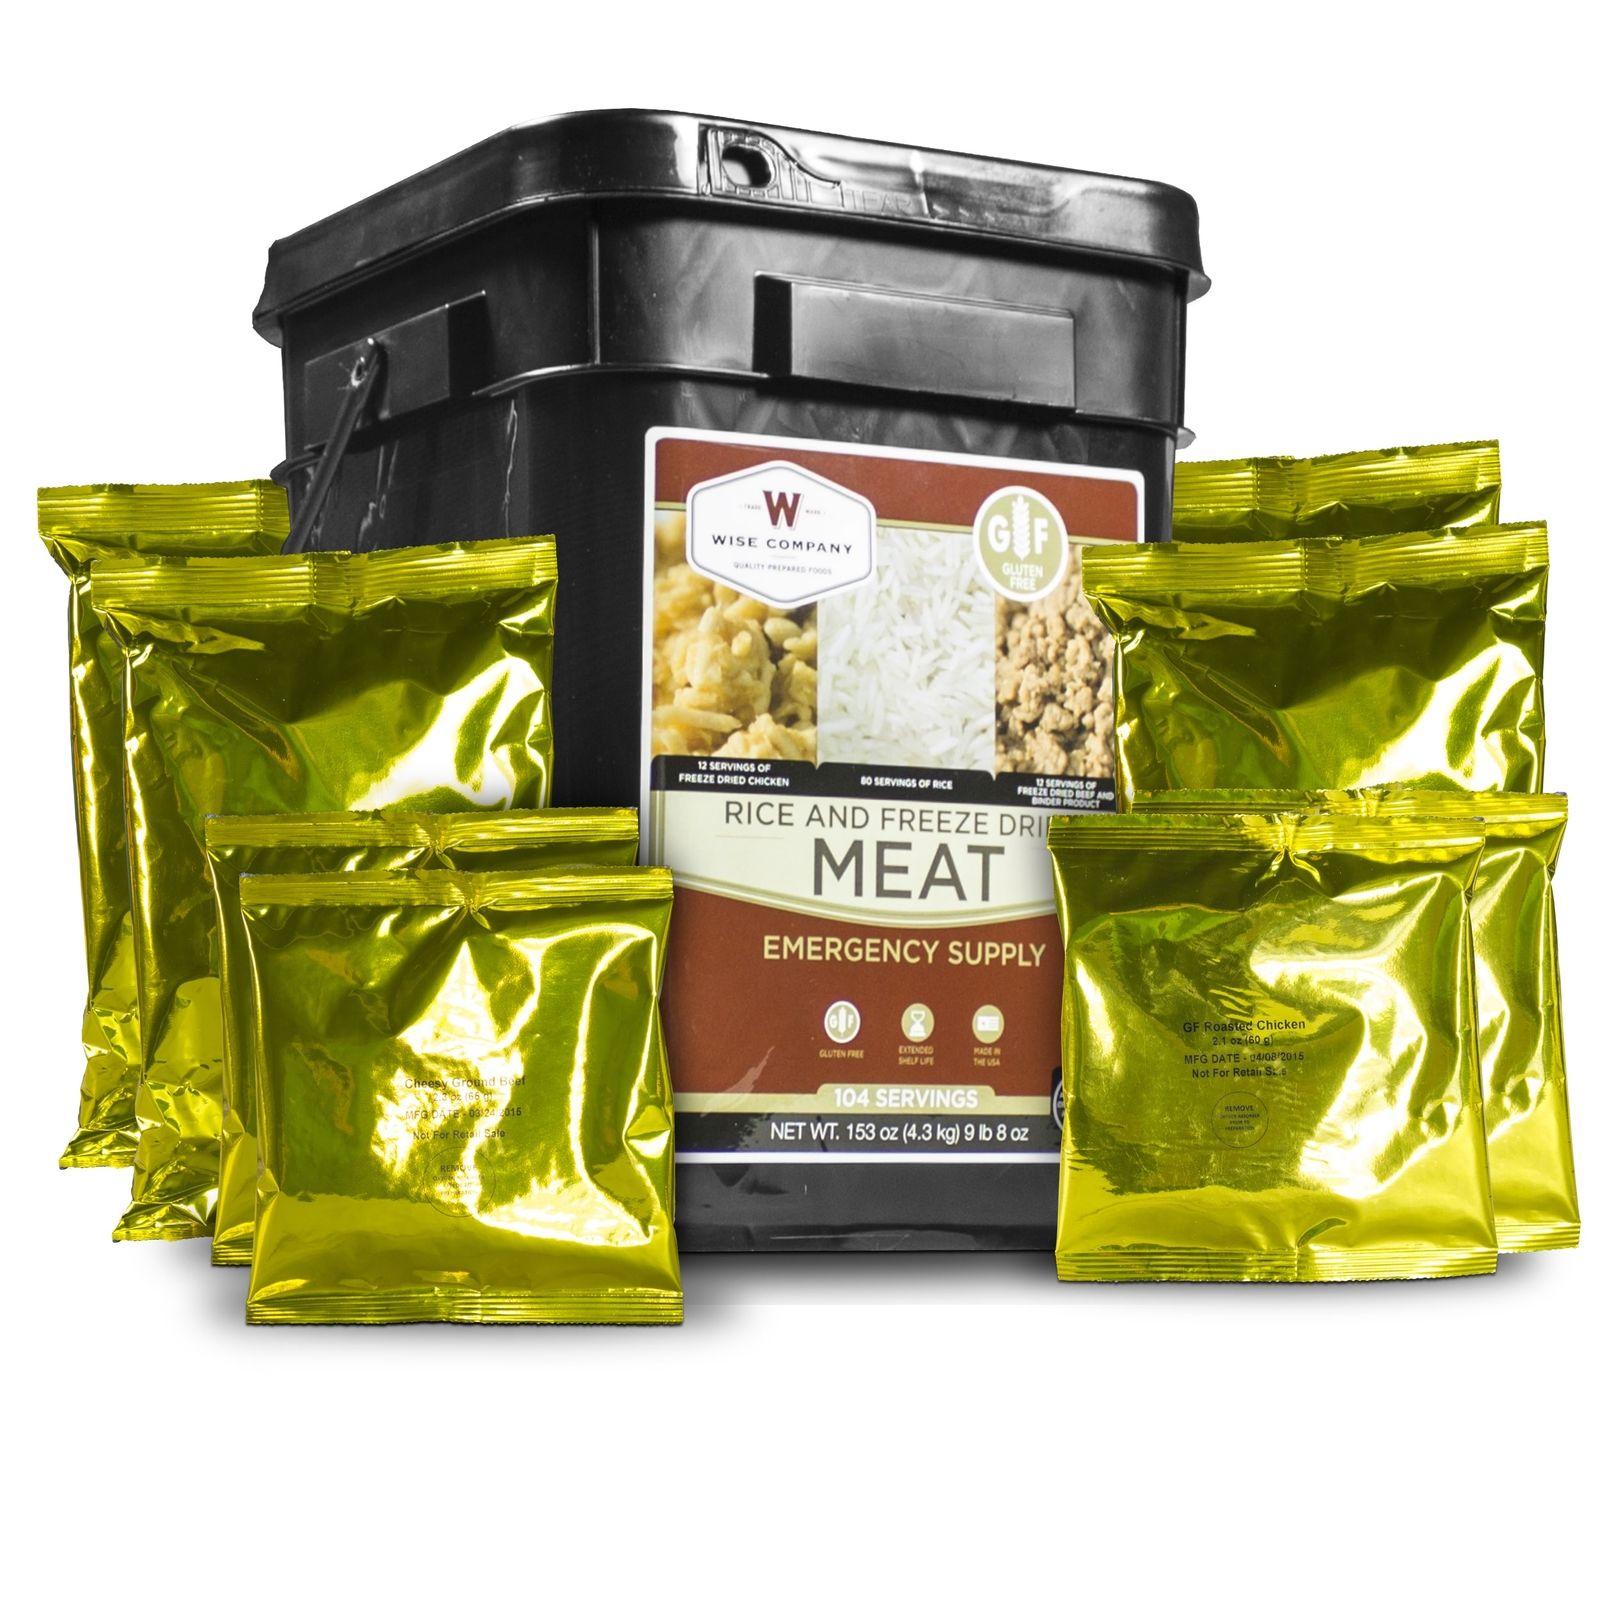 Emergency Survival Food Storage Gluten Free Meat Rice Supply Kit 104 Servings 1